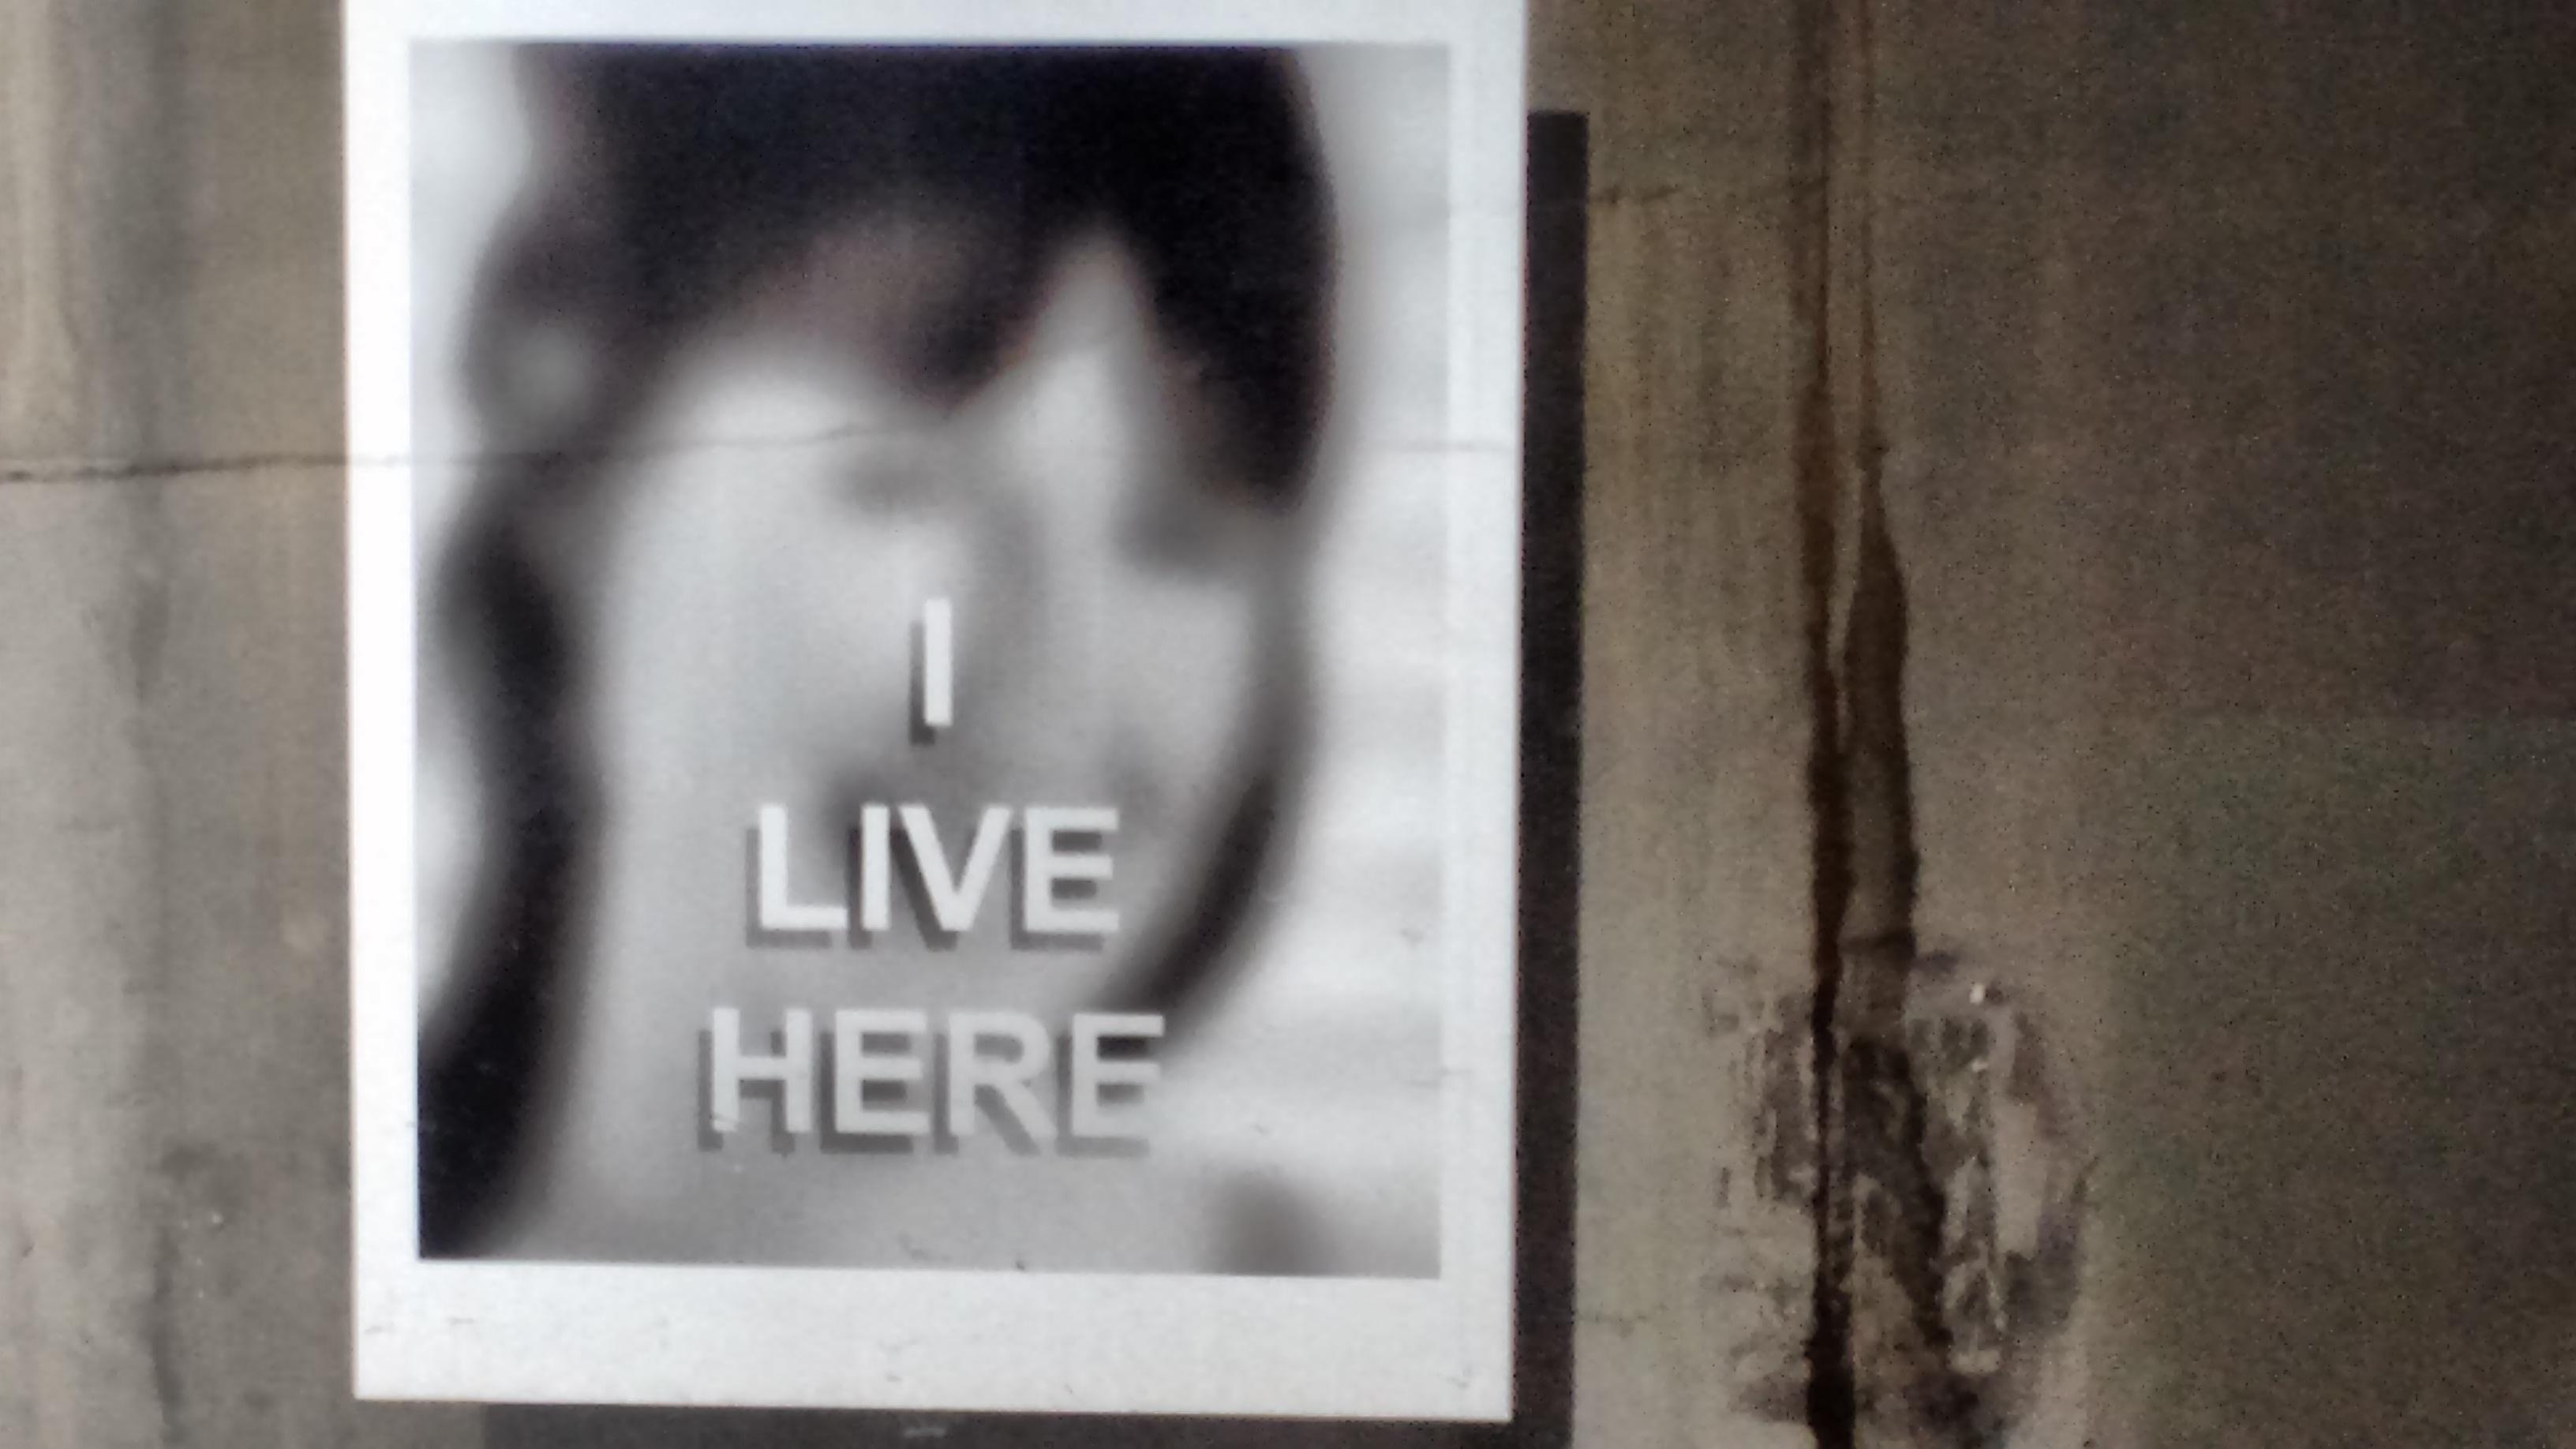 Image: Derek Besant's Public Art Piece/ Kaitlyn